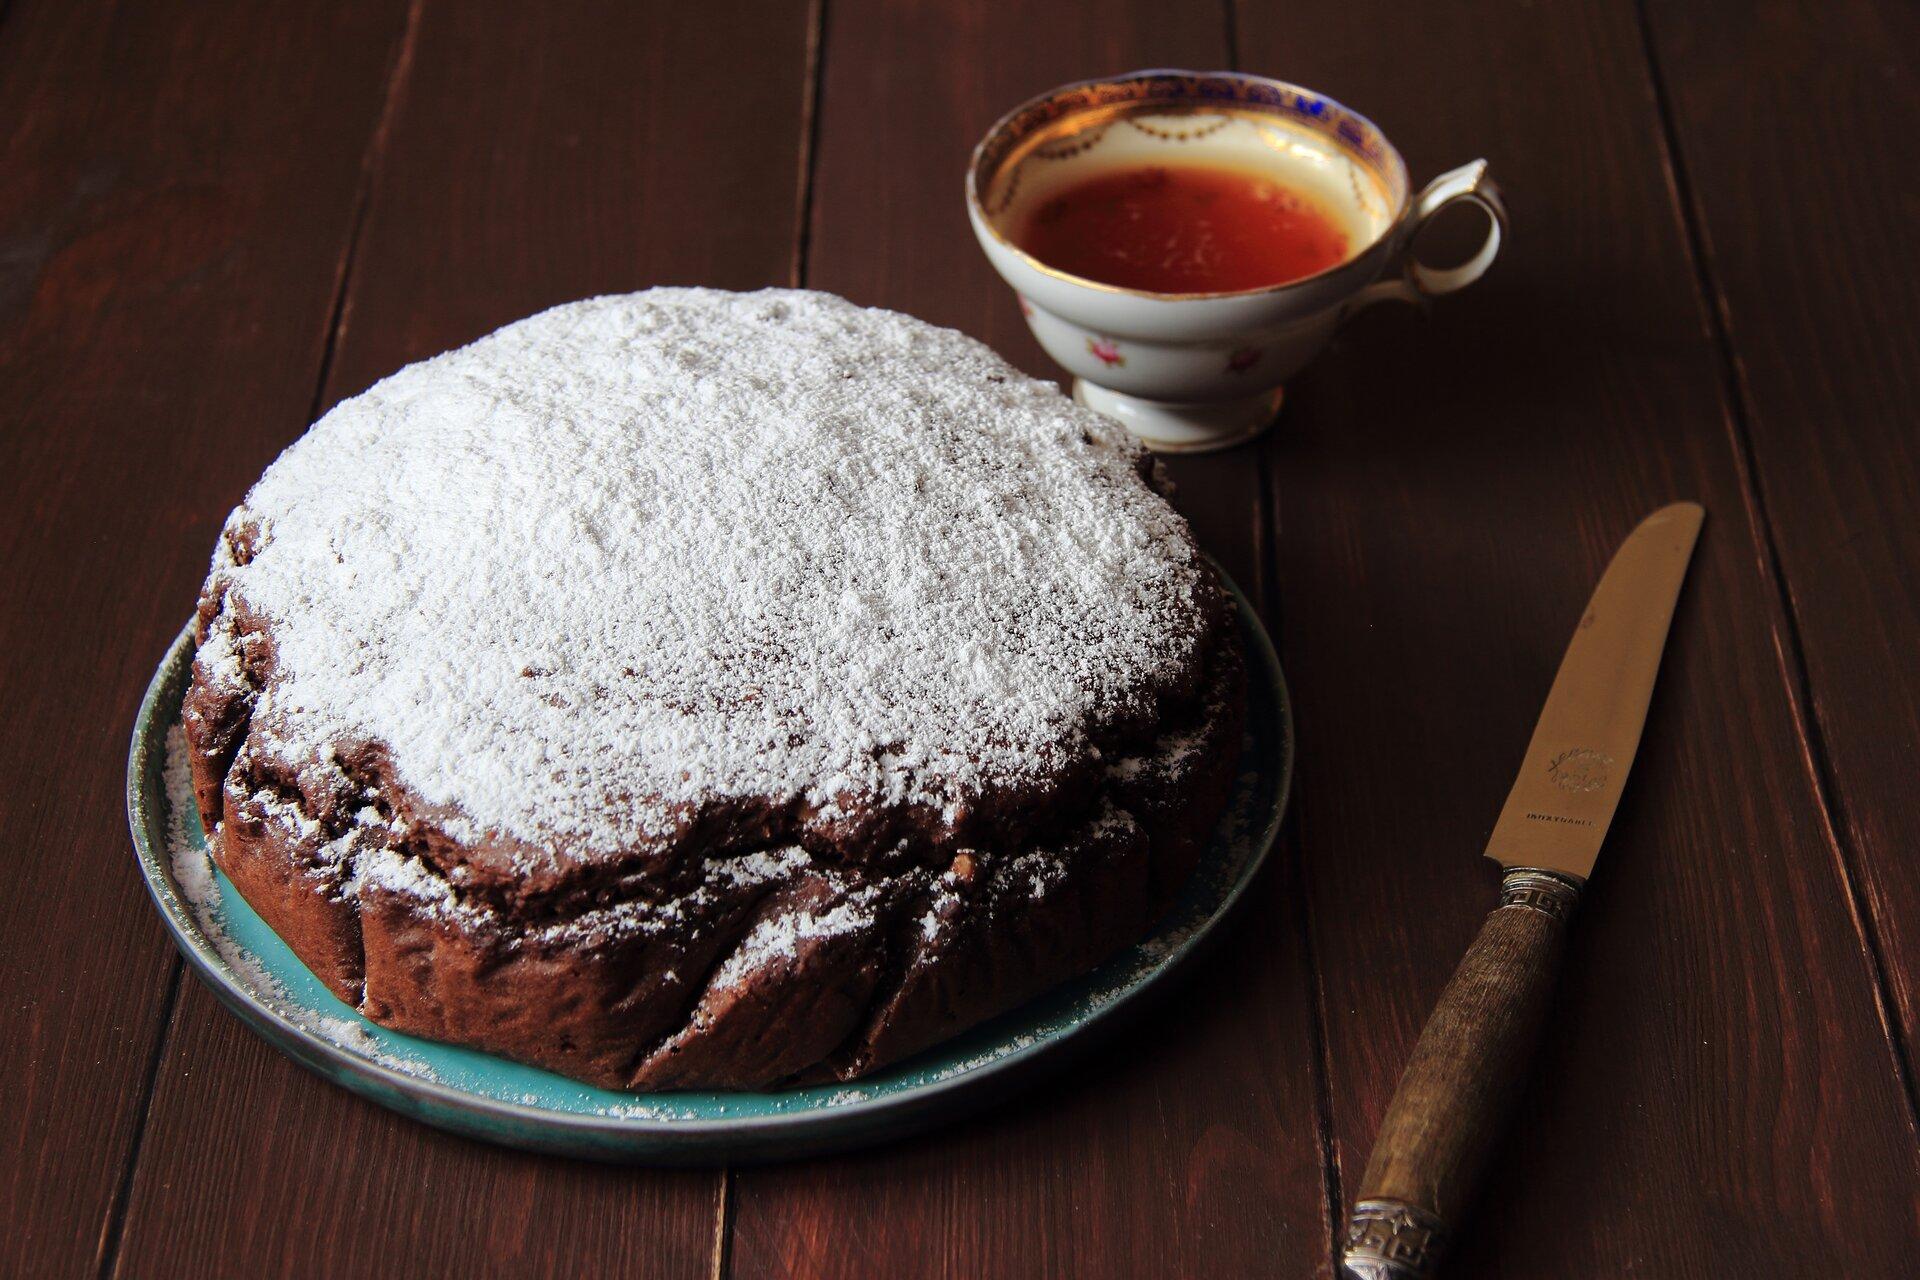 Dolci Da Credenza Torta Paradiso : Ricetta torta paradiso al cacao agrodolce